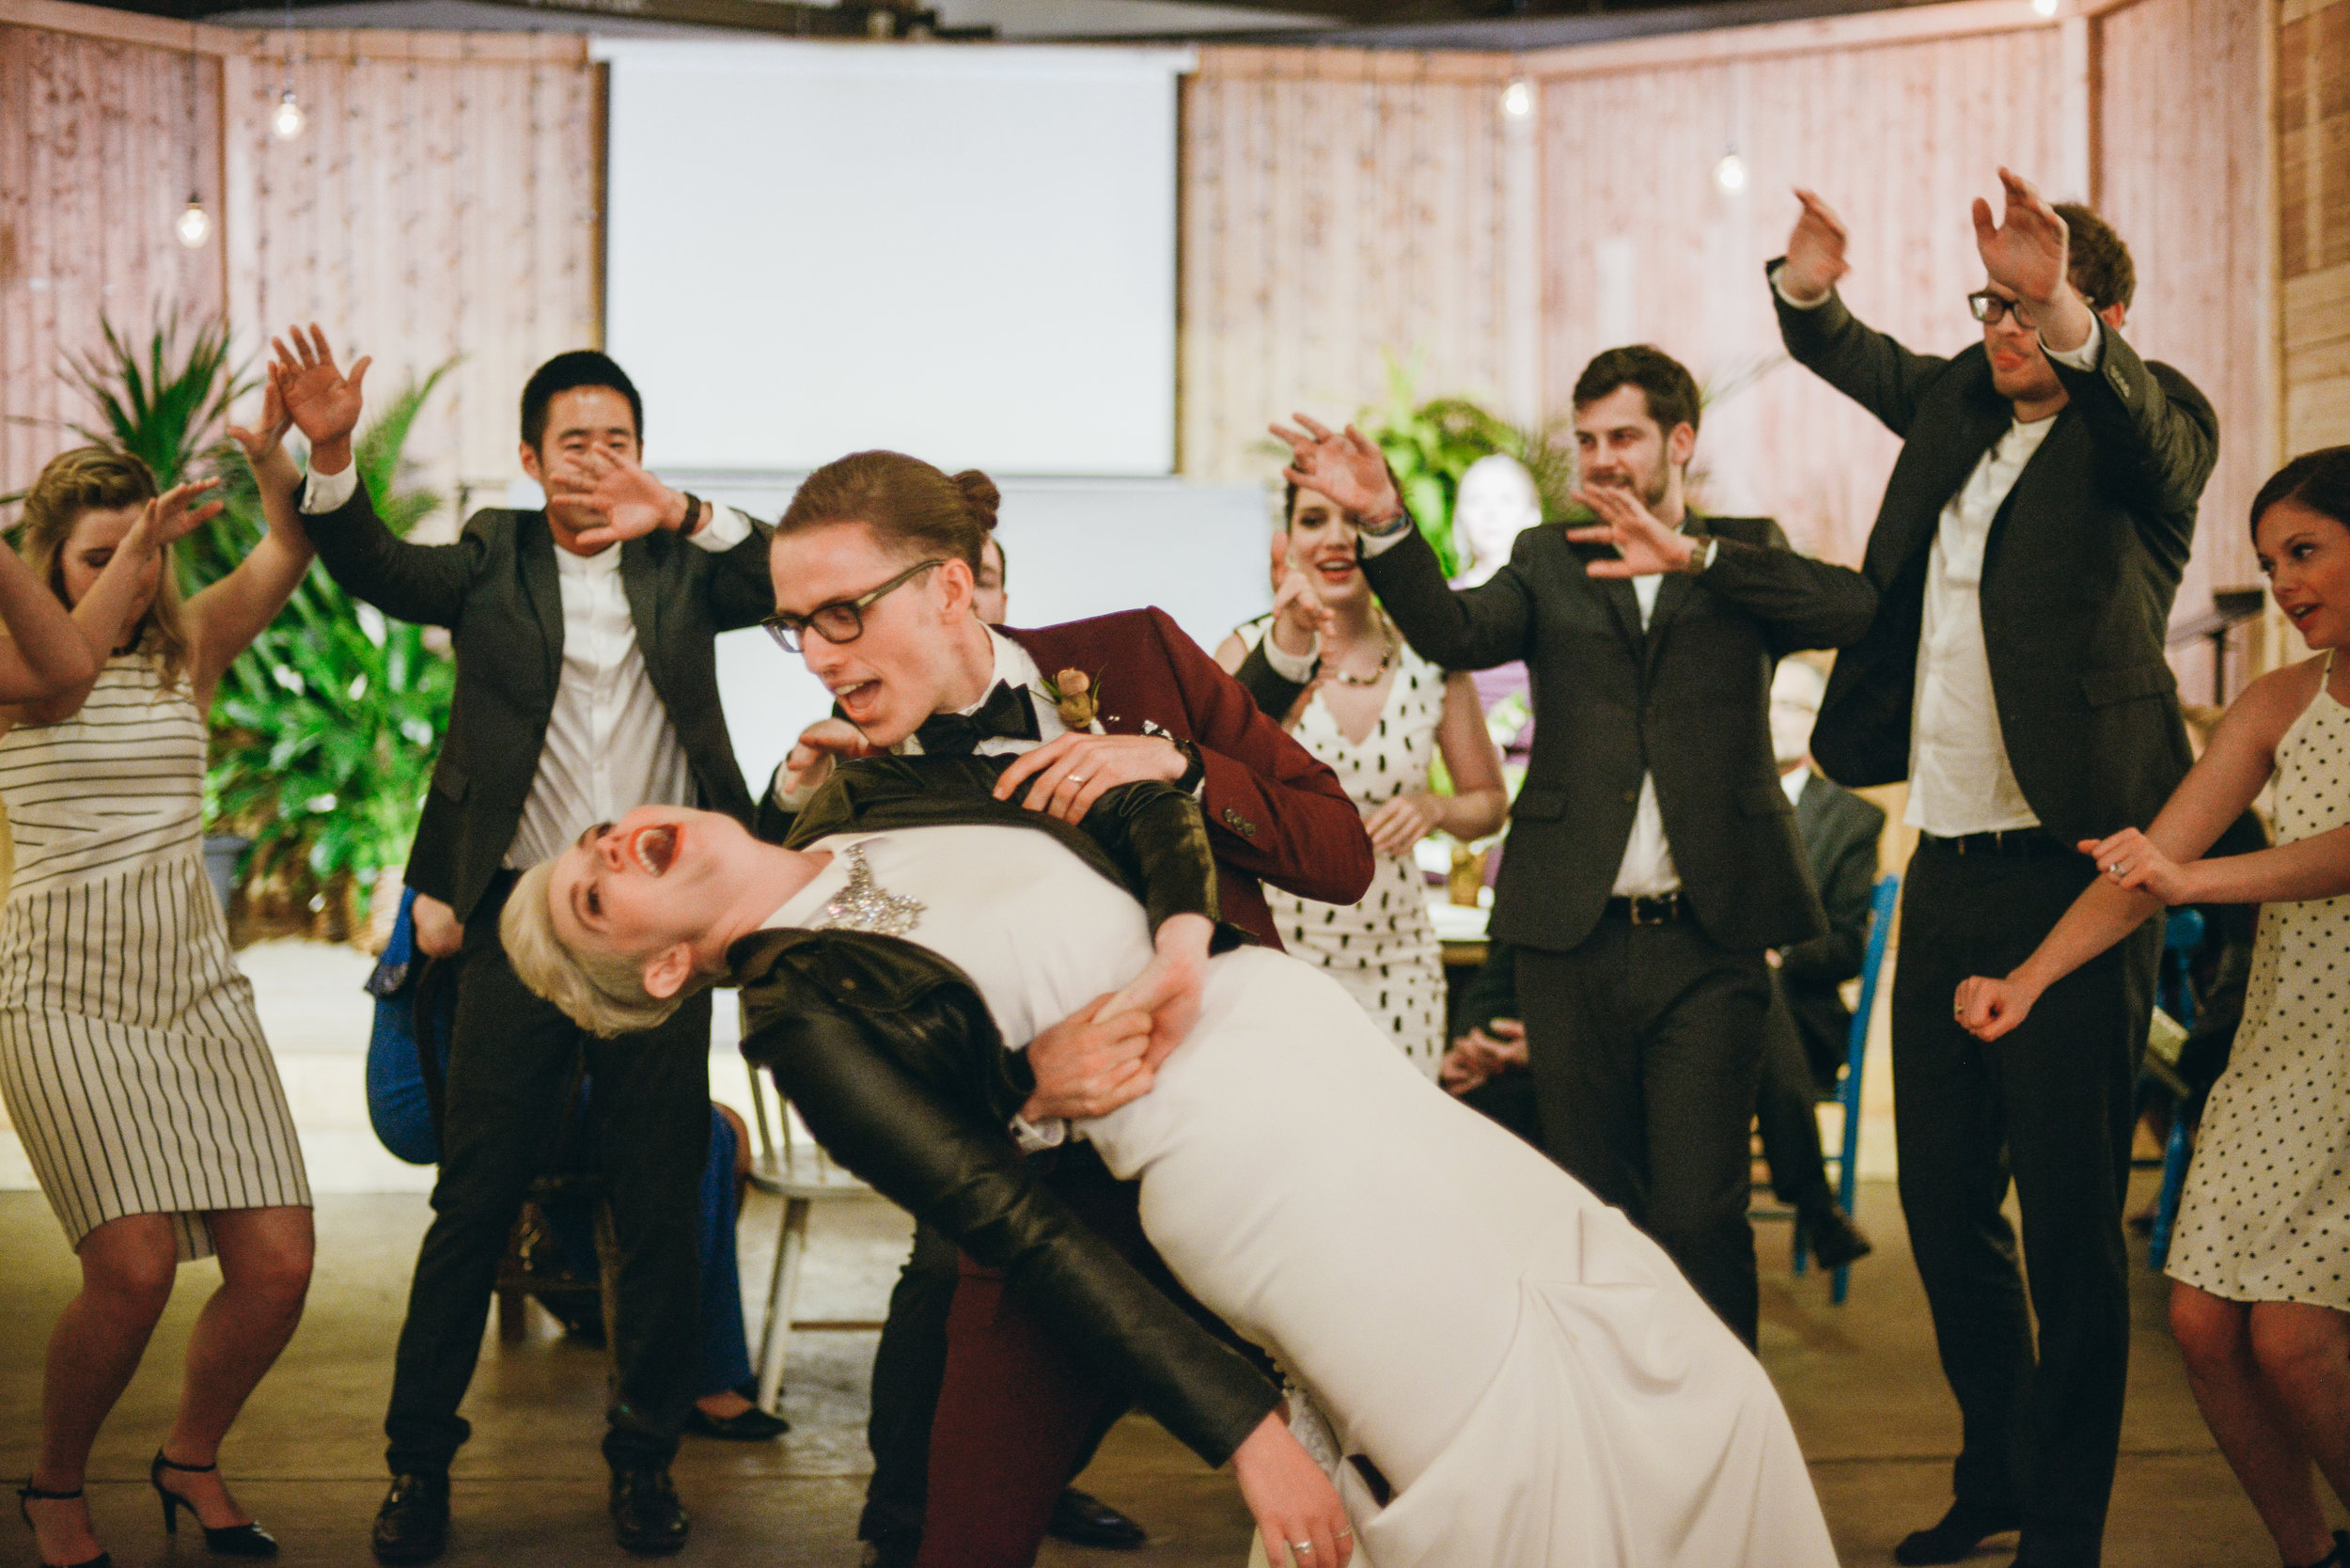 julia-hembree-photography-eden-village-church-wedding-savannah-warehouse-wedding-ivory-and-beau-bridal-boutique-savannah-florist-savannah-wedding-planner-savannah-event-design-scad-wedding-artist-wedding-savannah-funky-wedding-handmade-wedding-72.jpg